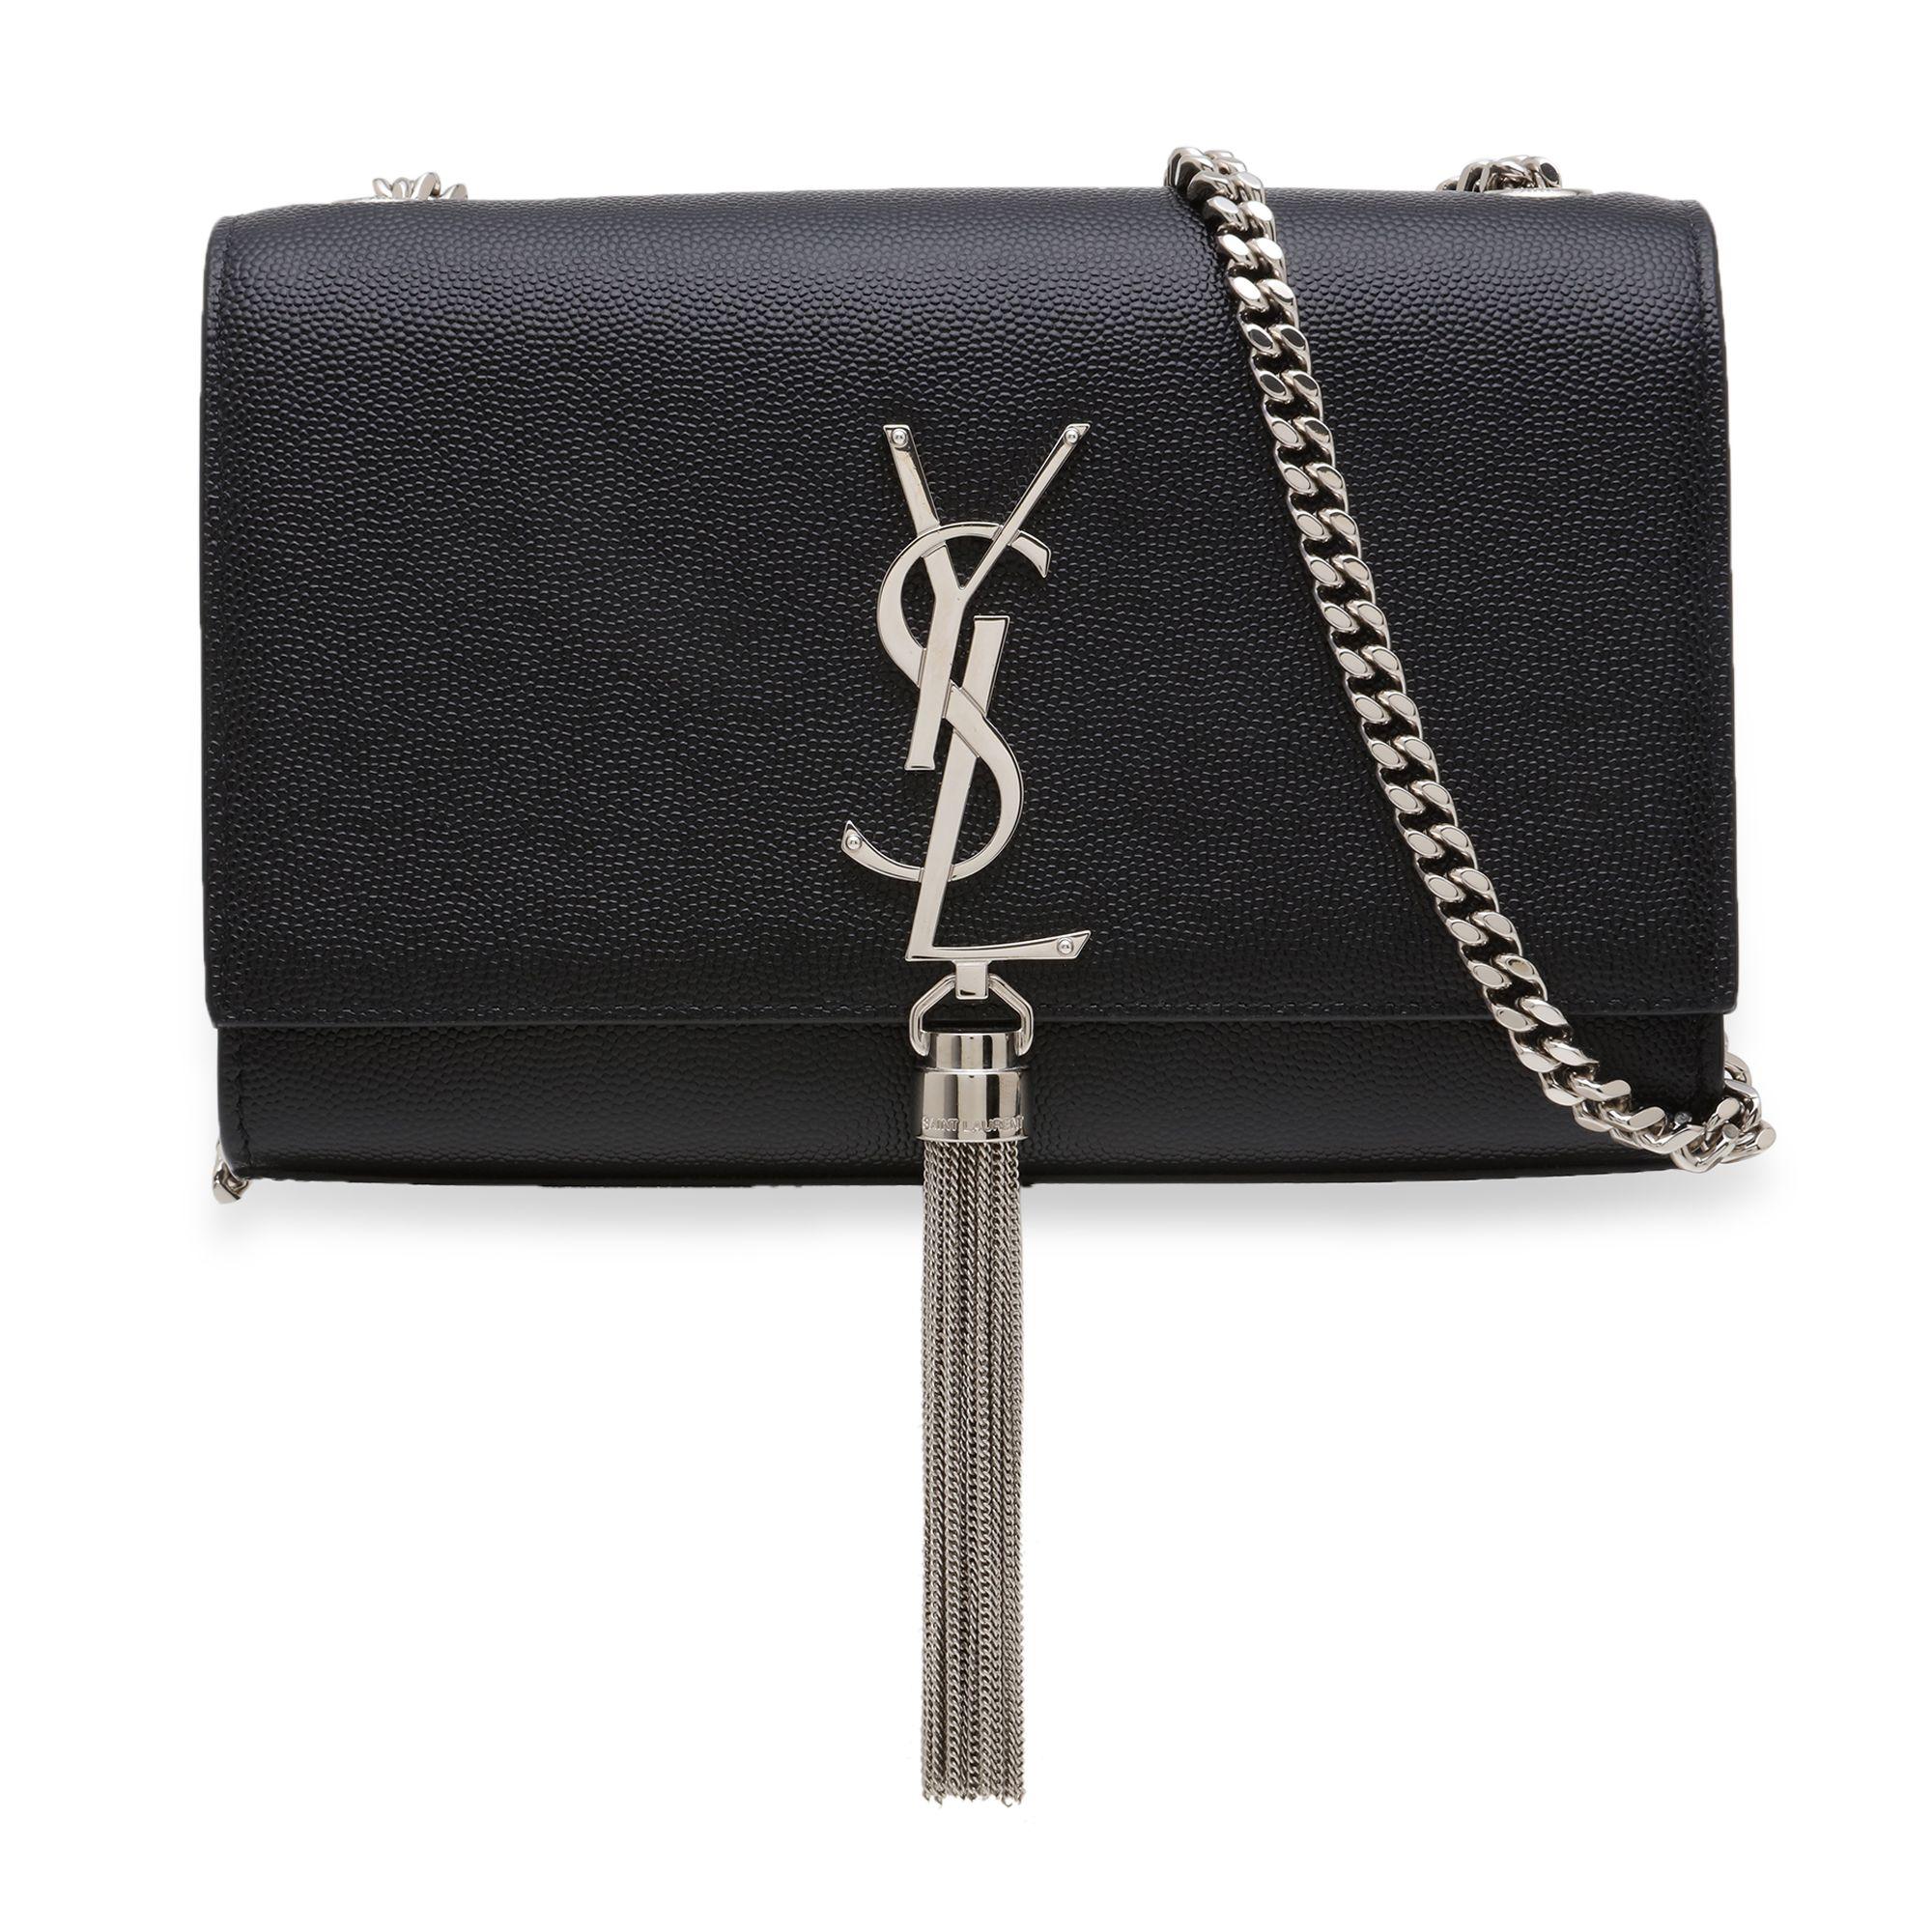 Kate crossbody bag